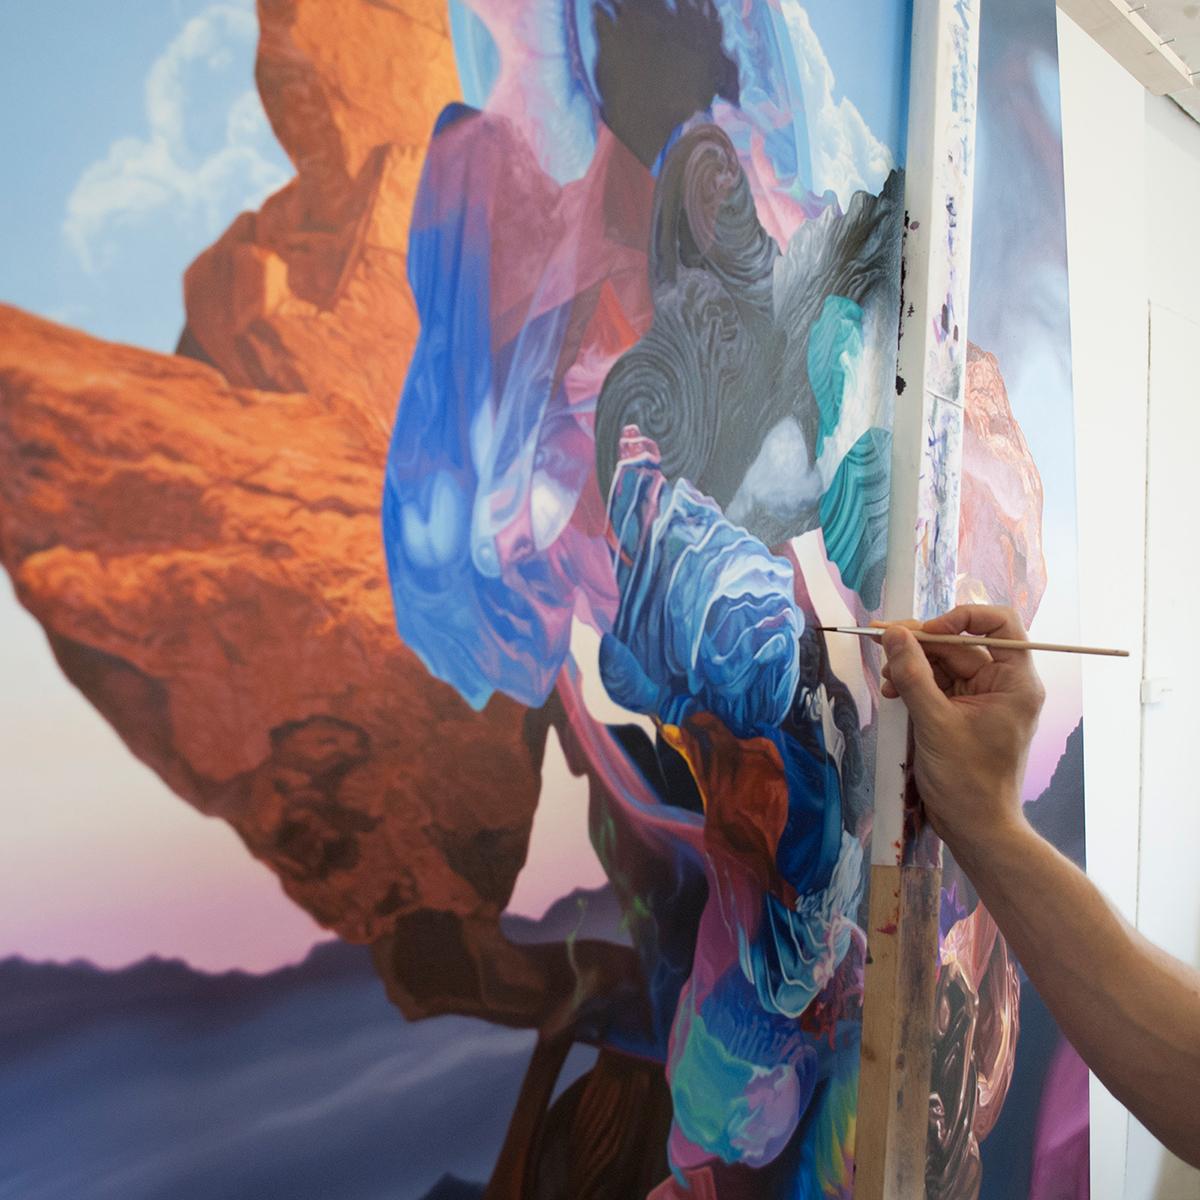 artist studio career gallery painting   ILLUSTRATION